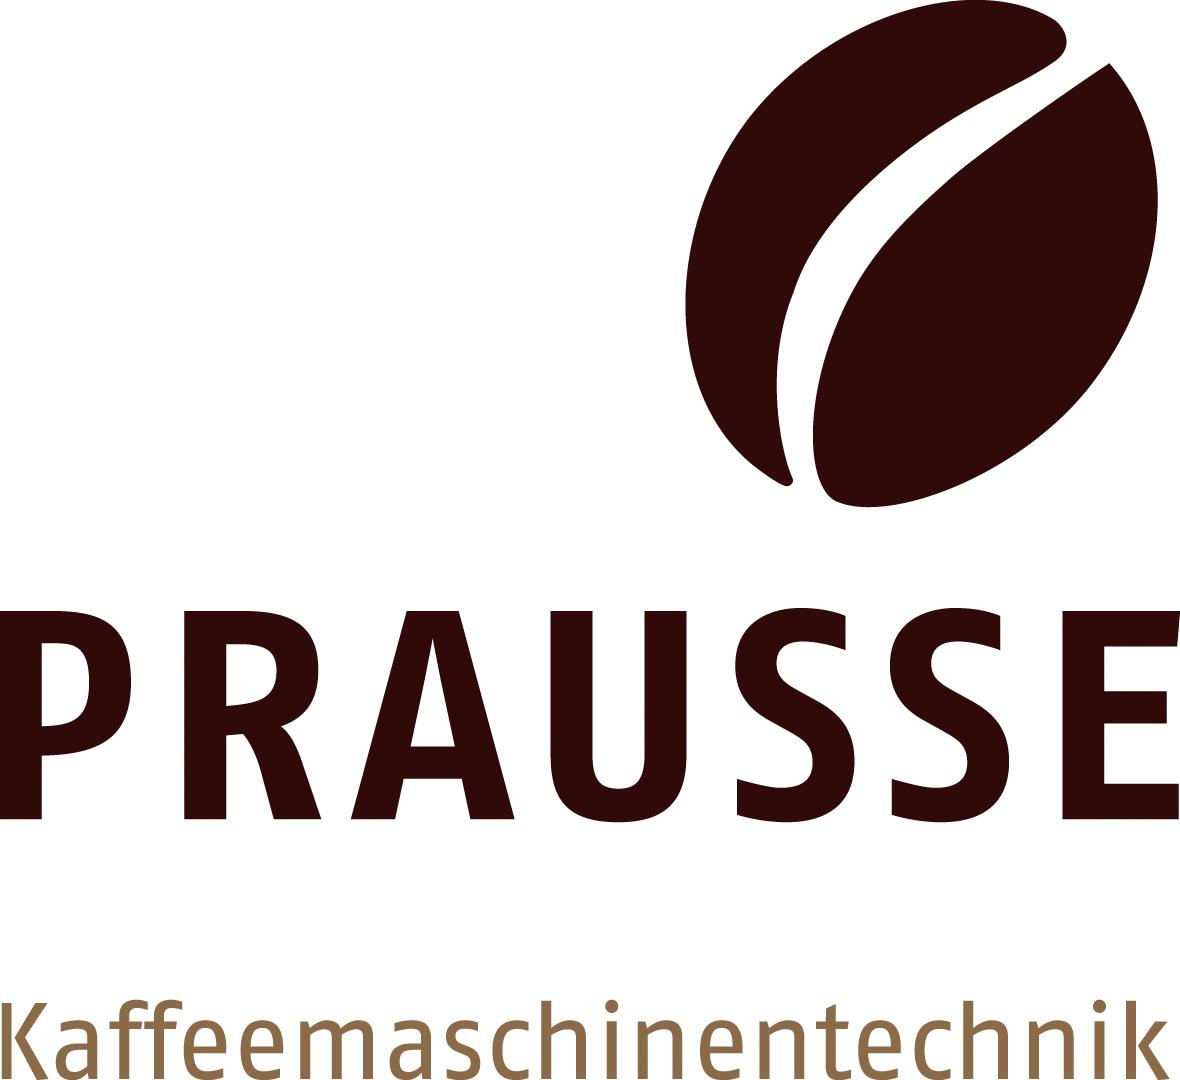 Kaffemaschinen-Technik Prausse Lohfelden